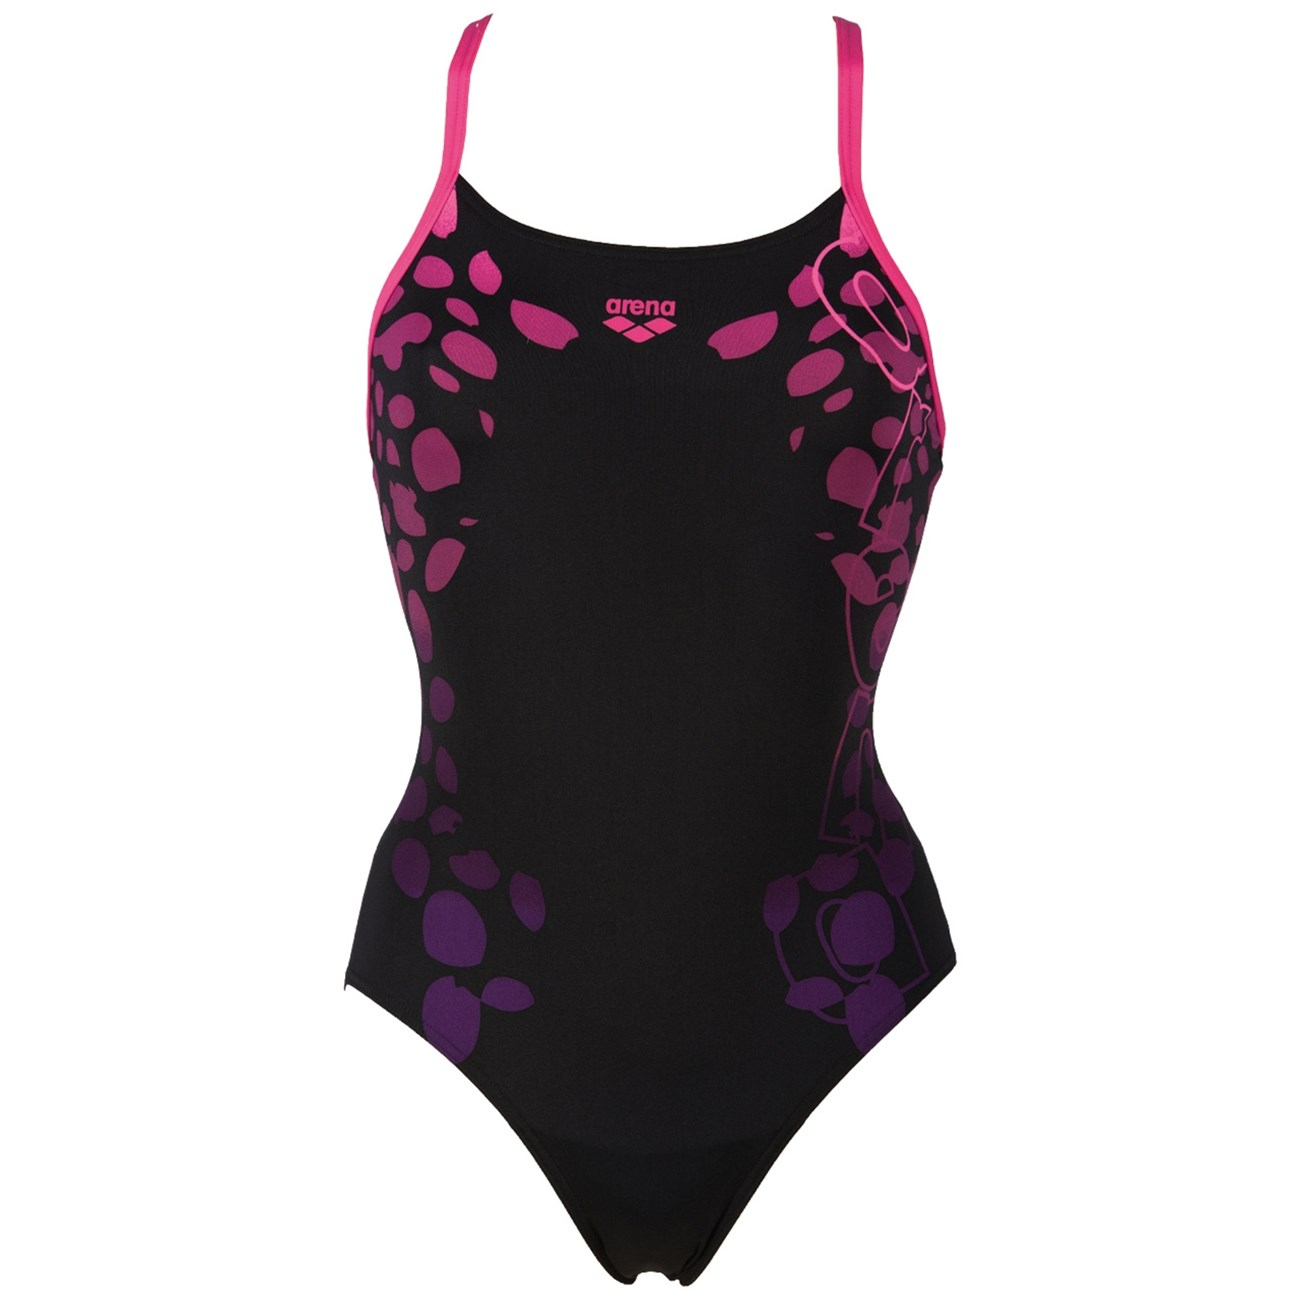 291bef9905f ARENA W NEBULA < Μαγιό Κολύμβησης | INTERSPORT